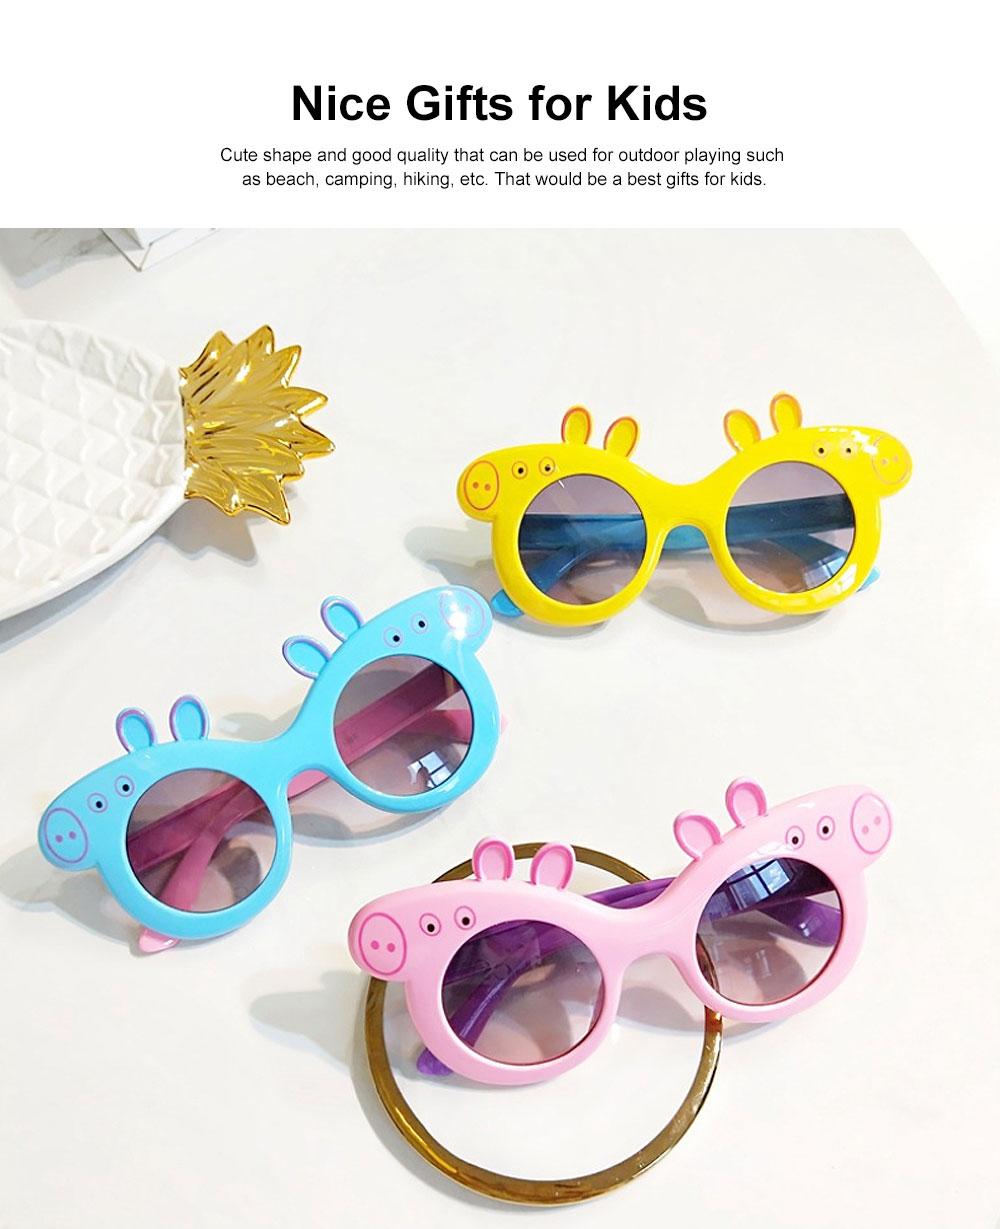 Peppa Pig Cute Sunglasses Children Cartoon UV400 Sun Protection Kid Costume Sunglasses Best Gifts for Kids 1